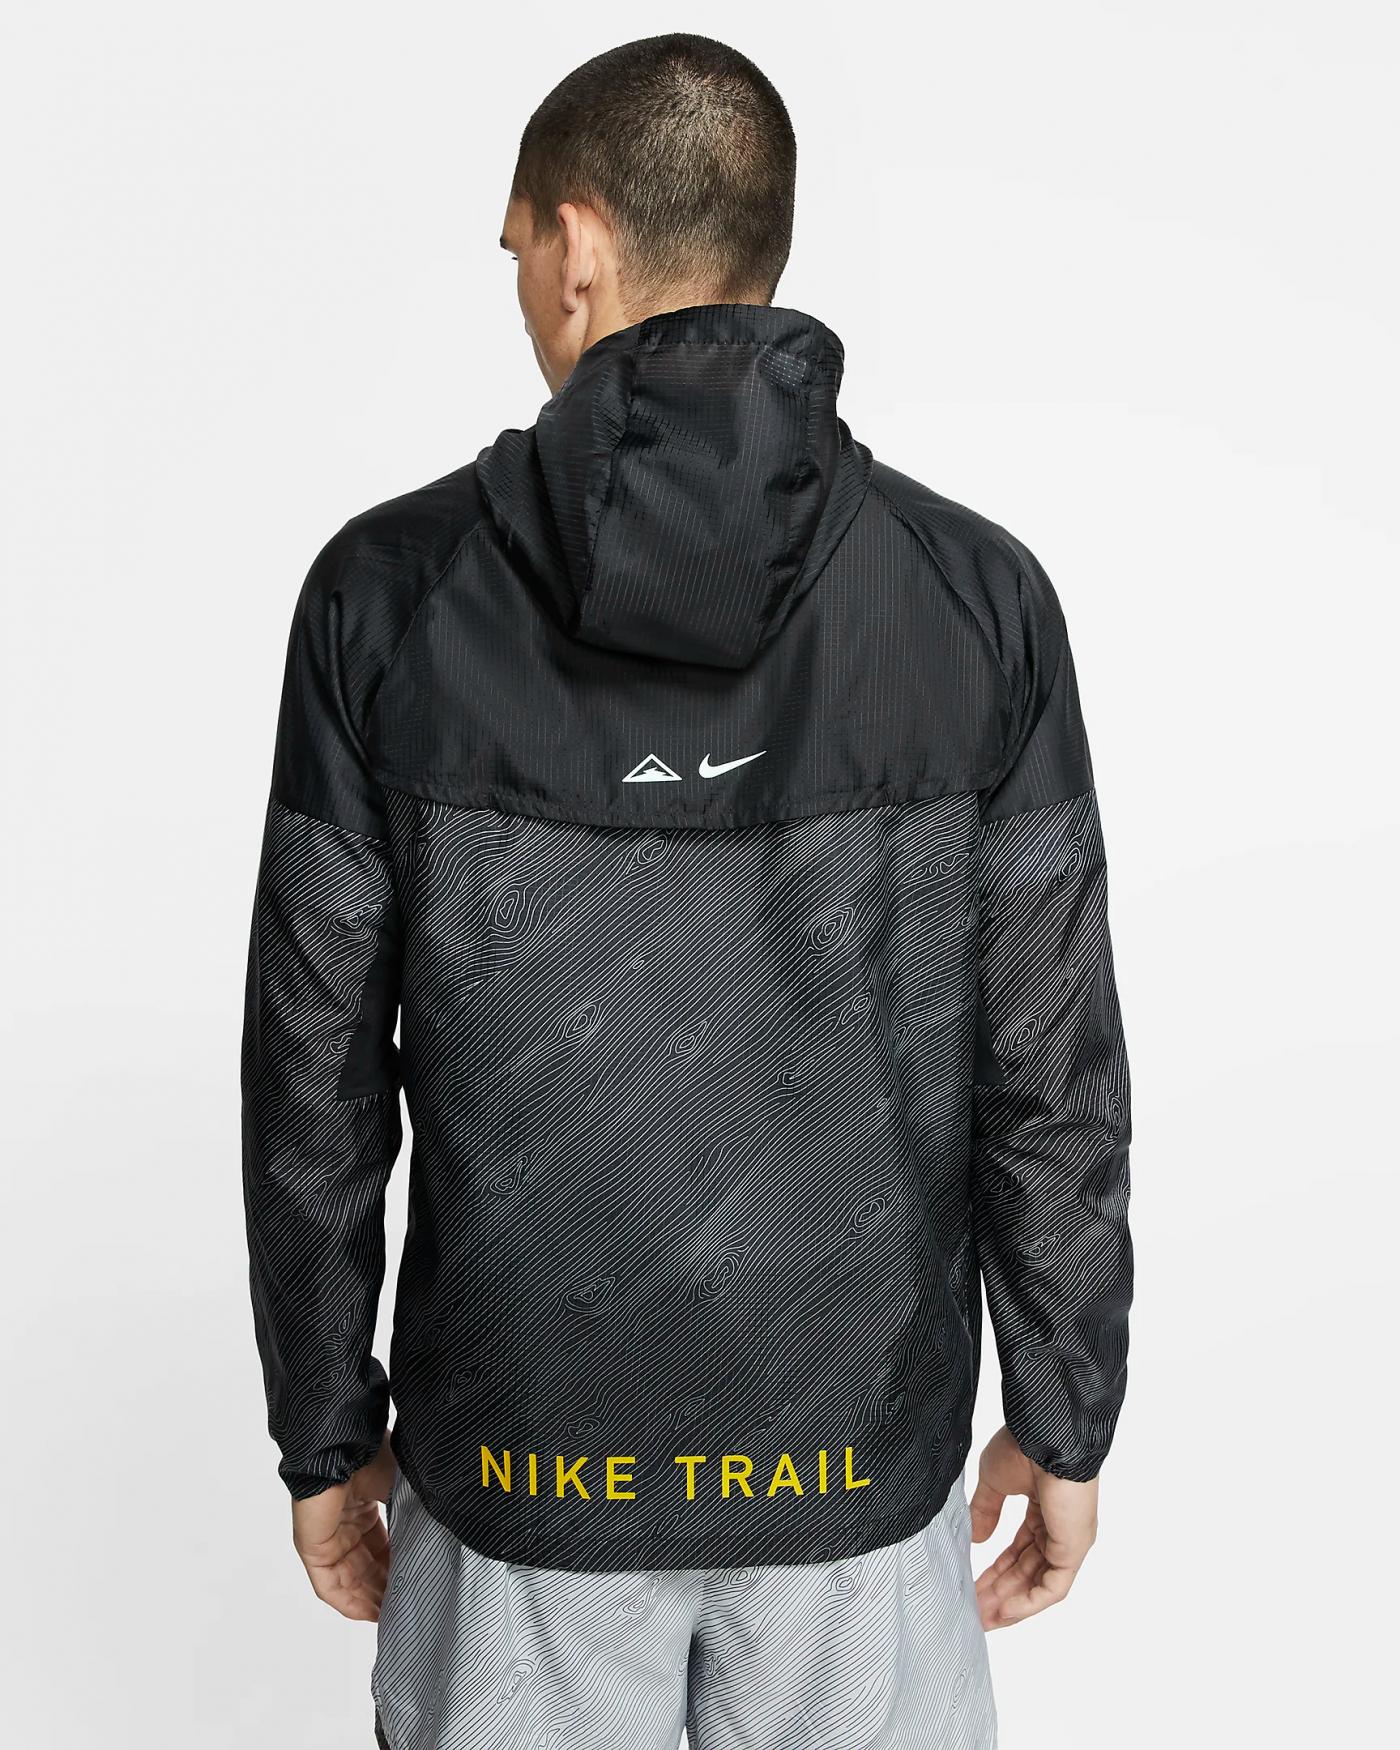 nike-trail-débardeur-veste-homme-runpack-2